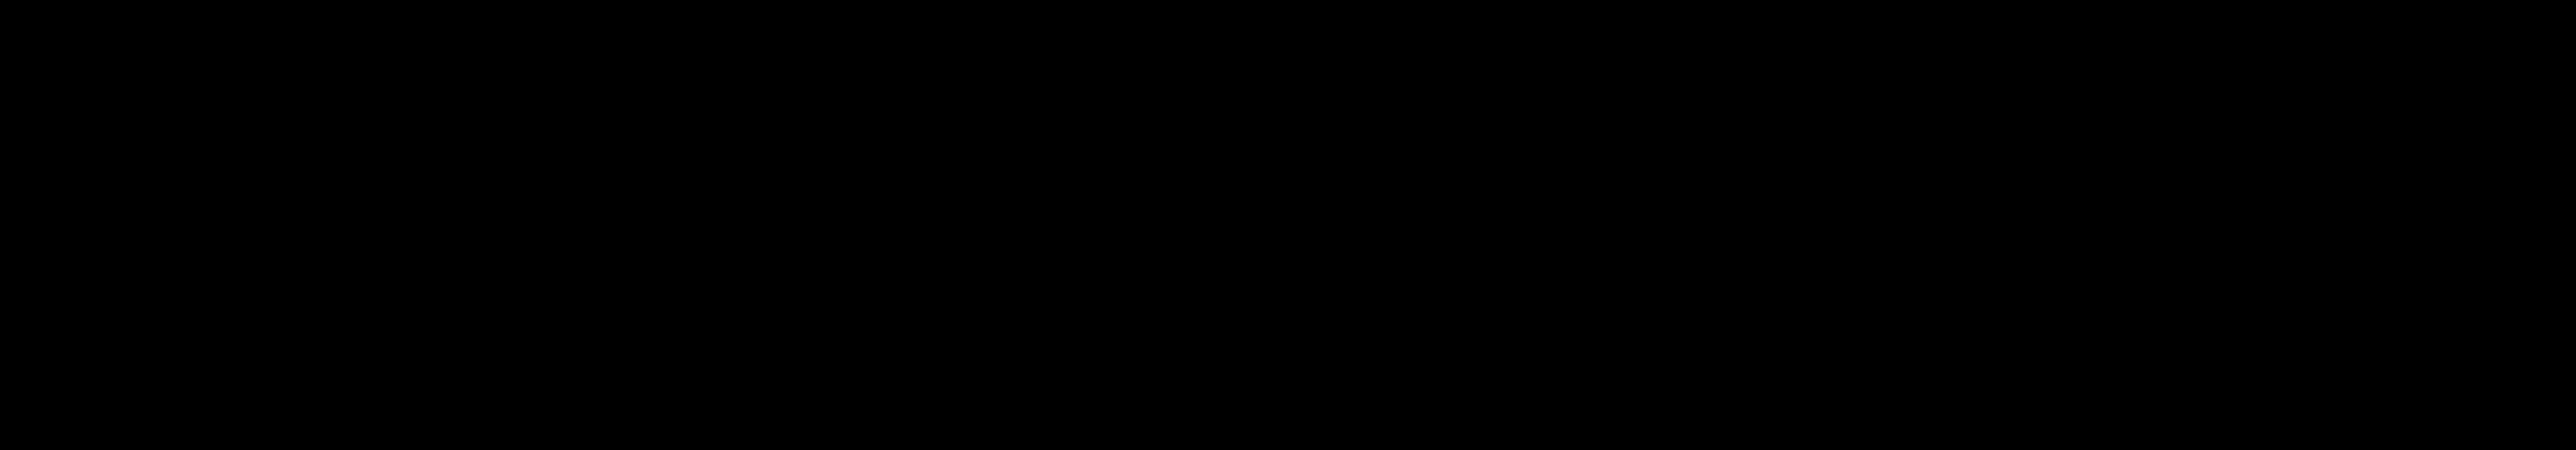 blackberry � logos download